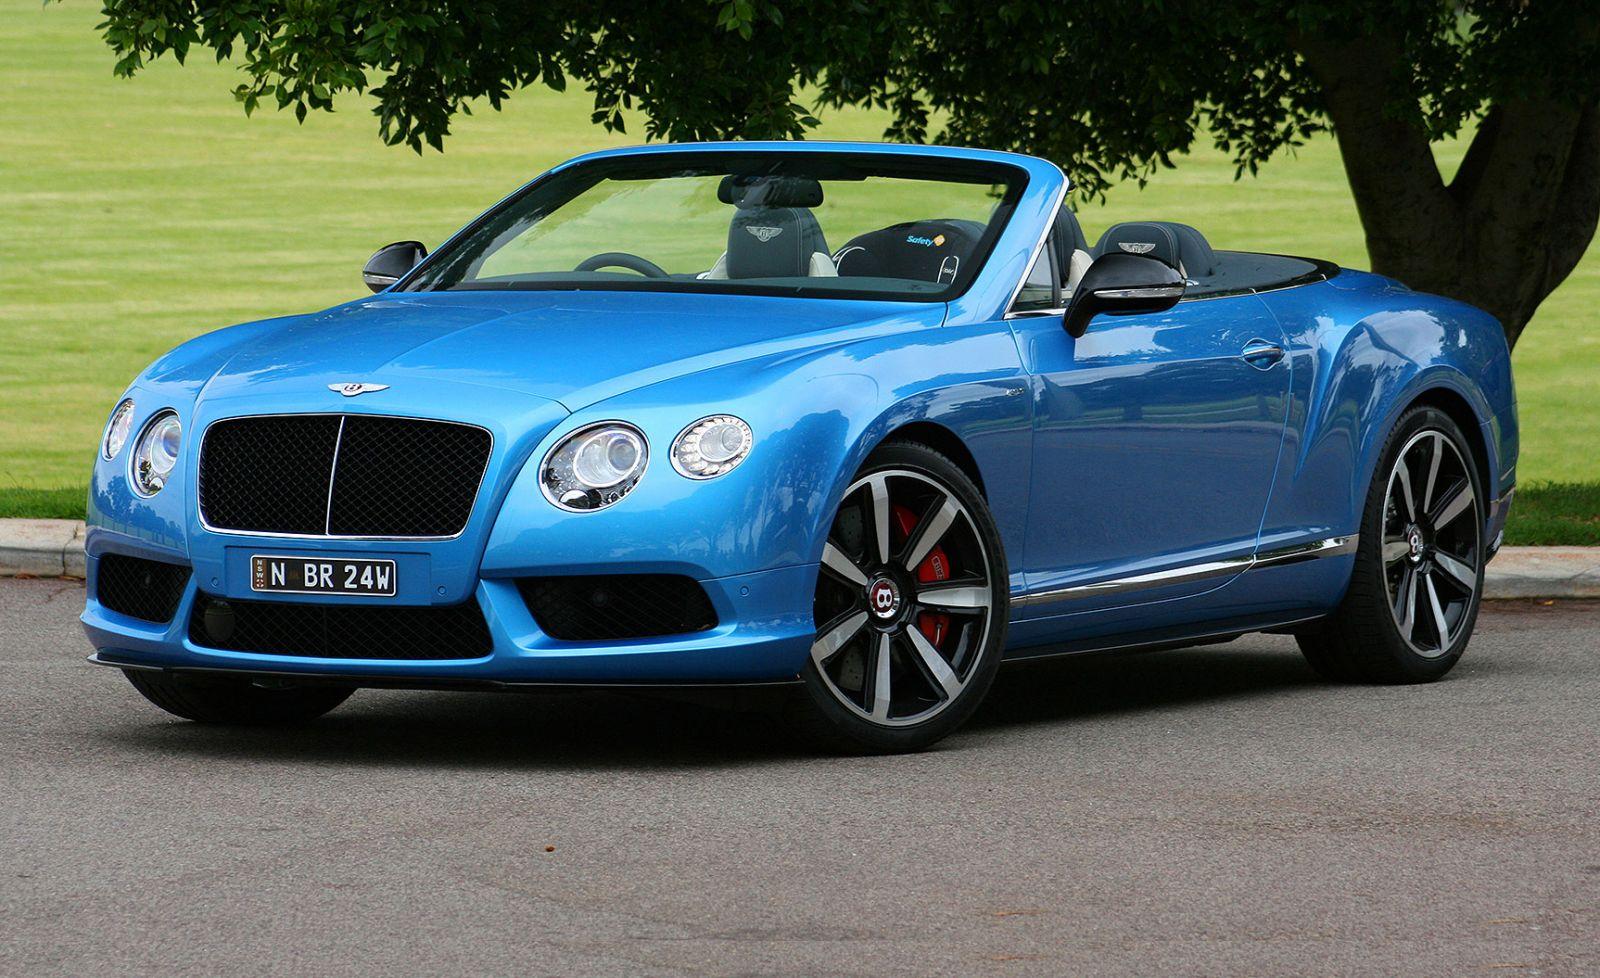 2015 Bentley Continental GTC V8 S Convertible Review